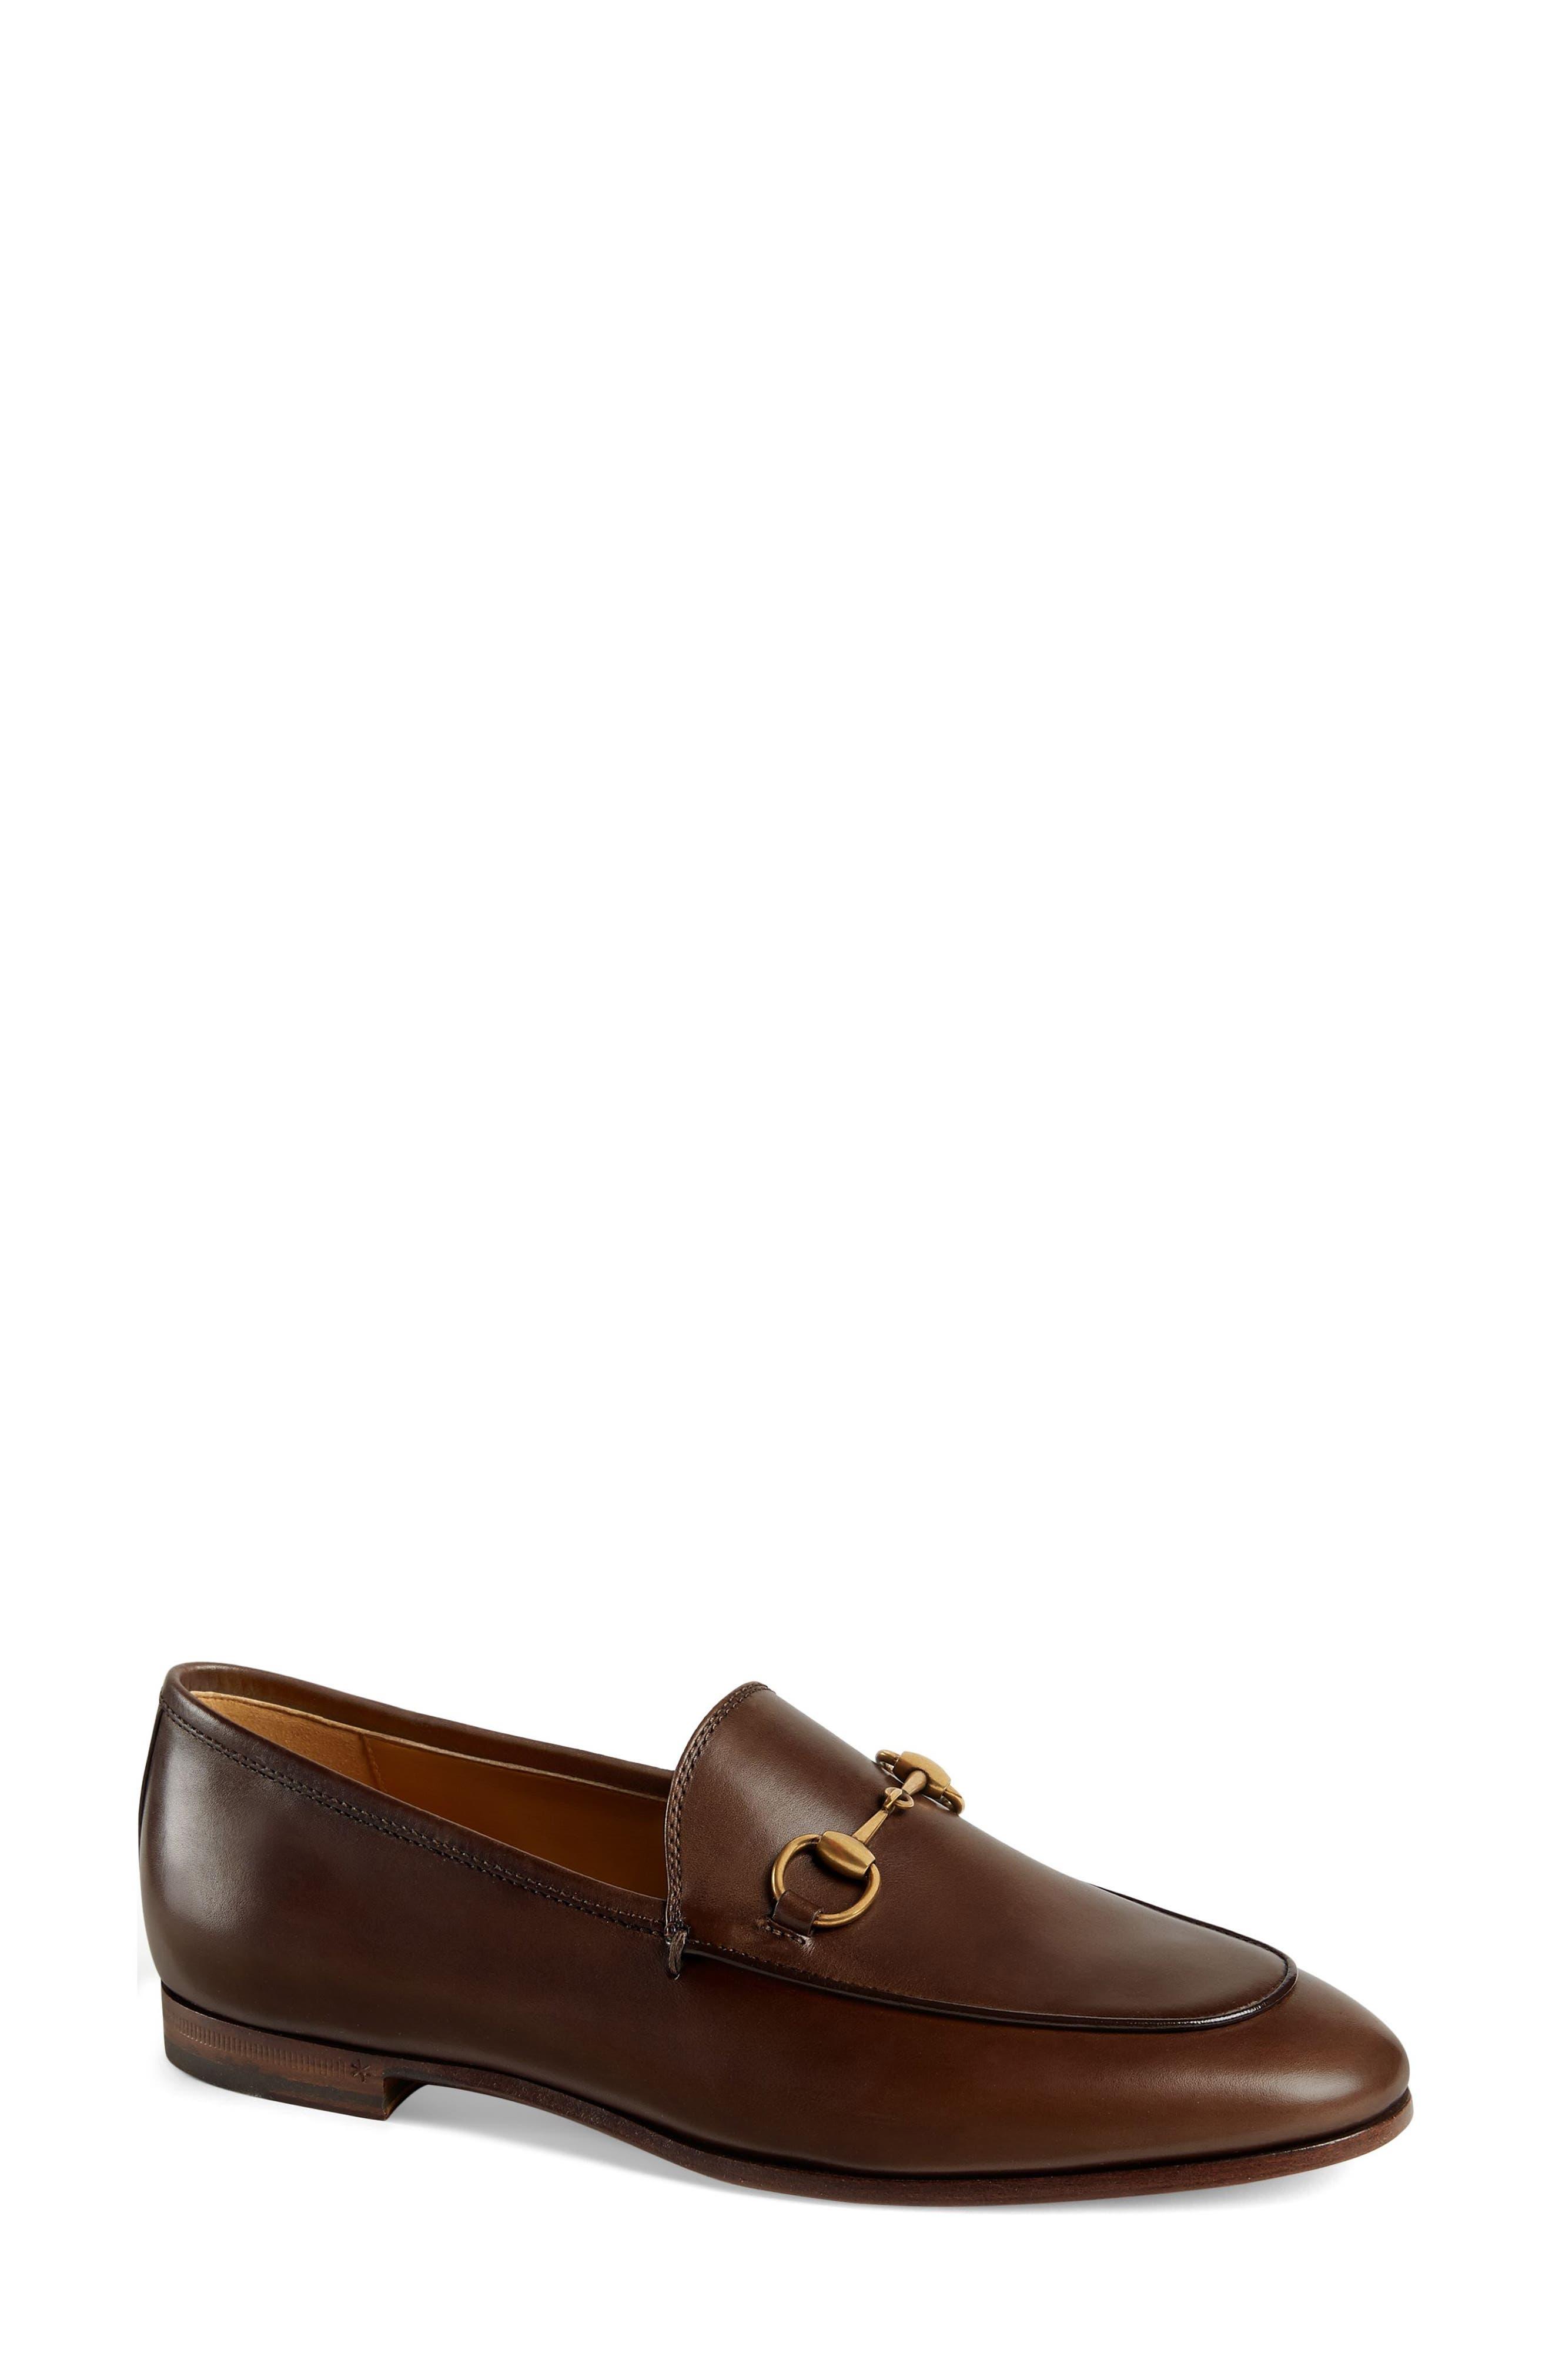 GUCCI 'Jordaan' Loafer, Main, color, FONDENTE BROWN